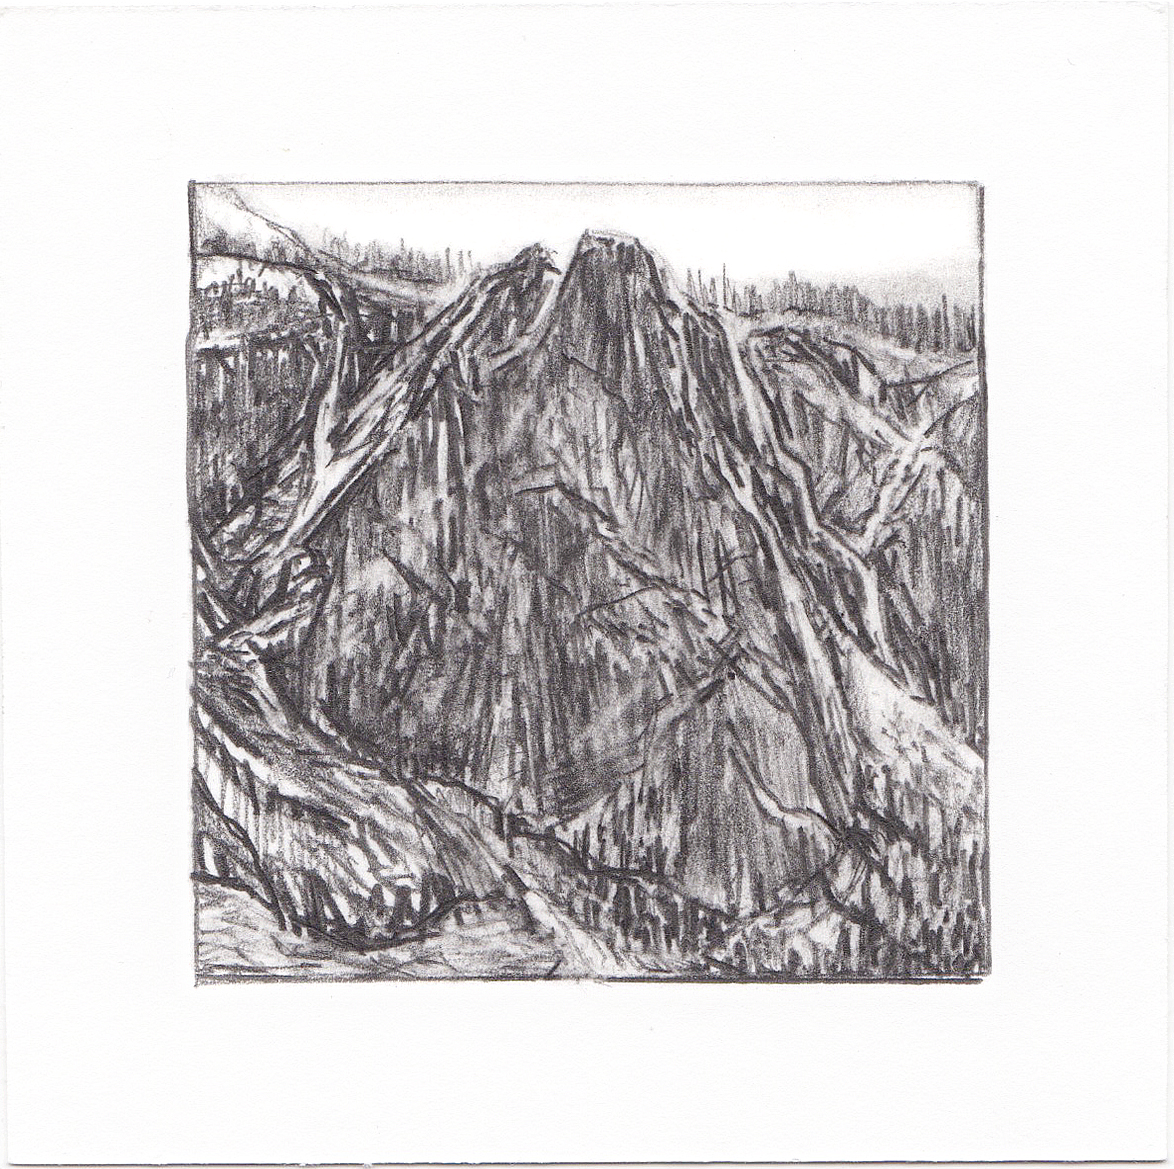 #63 Yosemite National Park, California | 3x3 | graphite